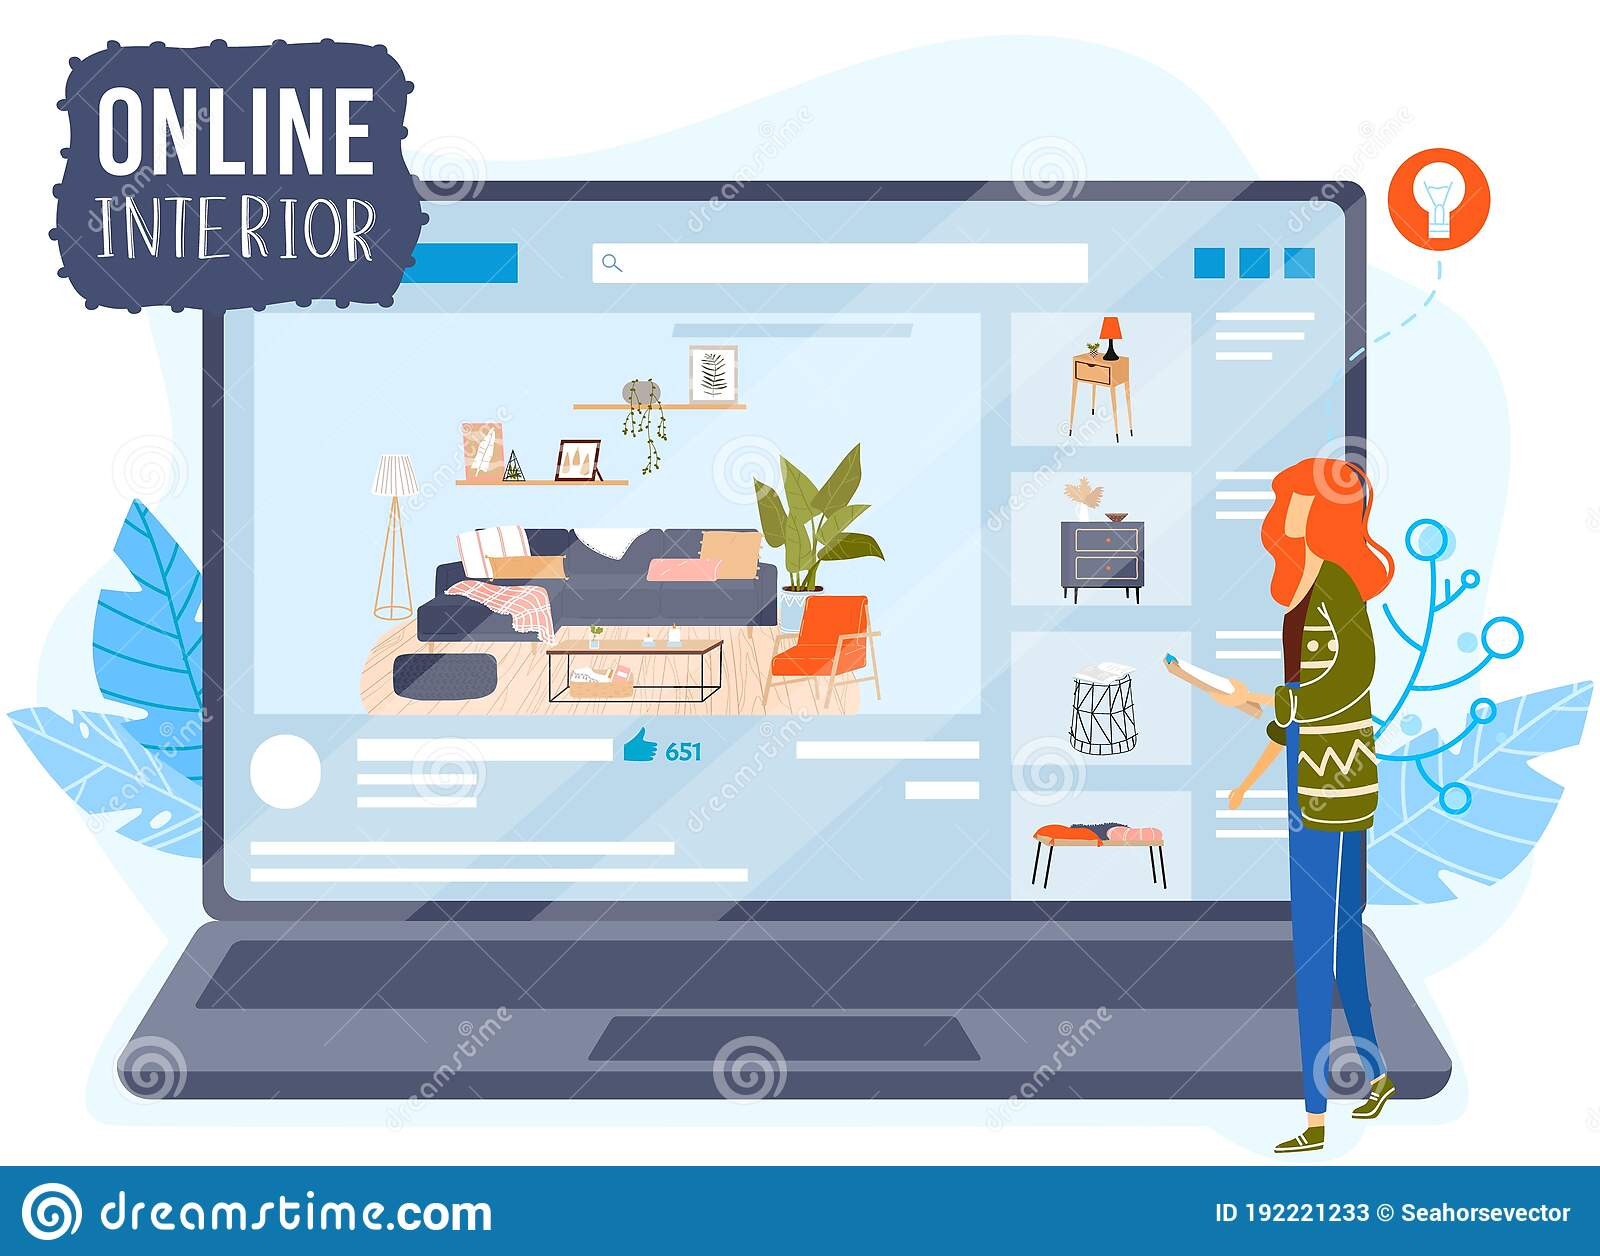 Online Room Interior App Design Concept Vector Illustration Cartoon Architect Designer Character Planning Home Stock Vector Illustration Of Flat Application 192221233